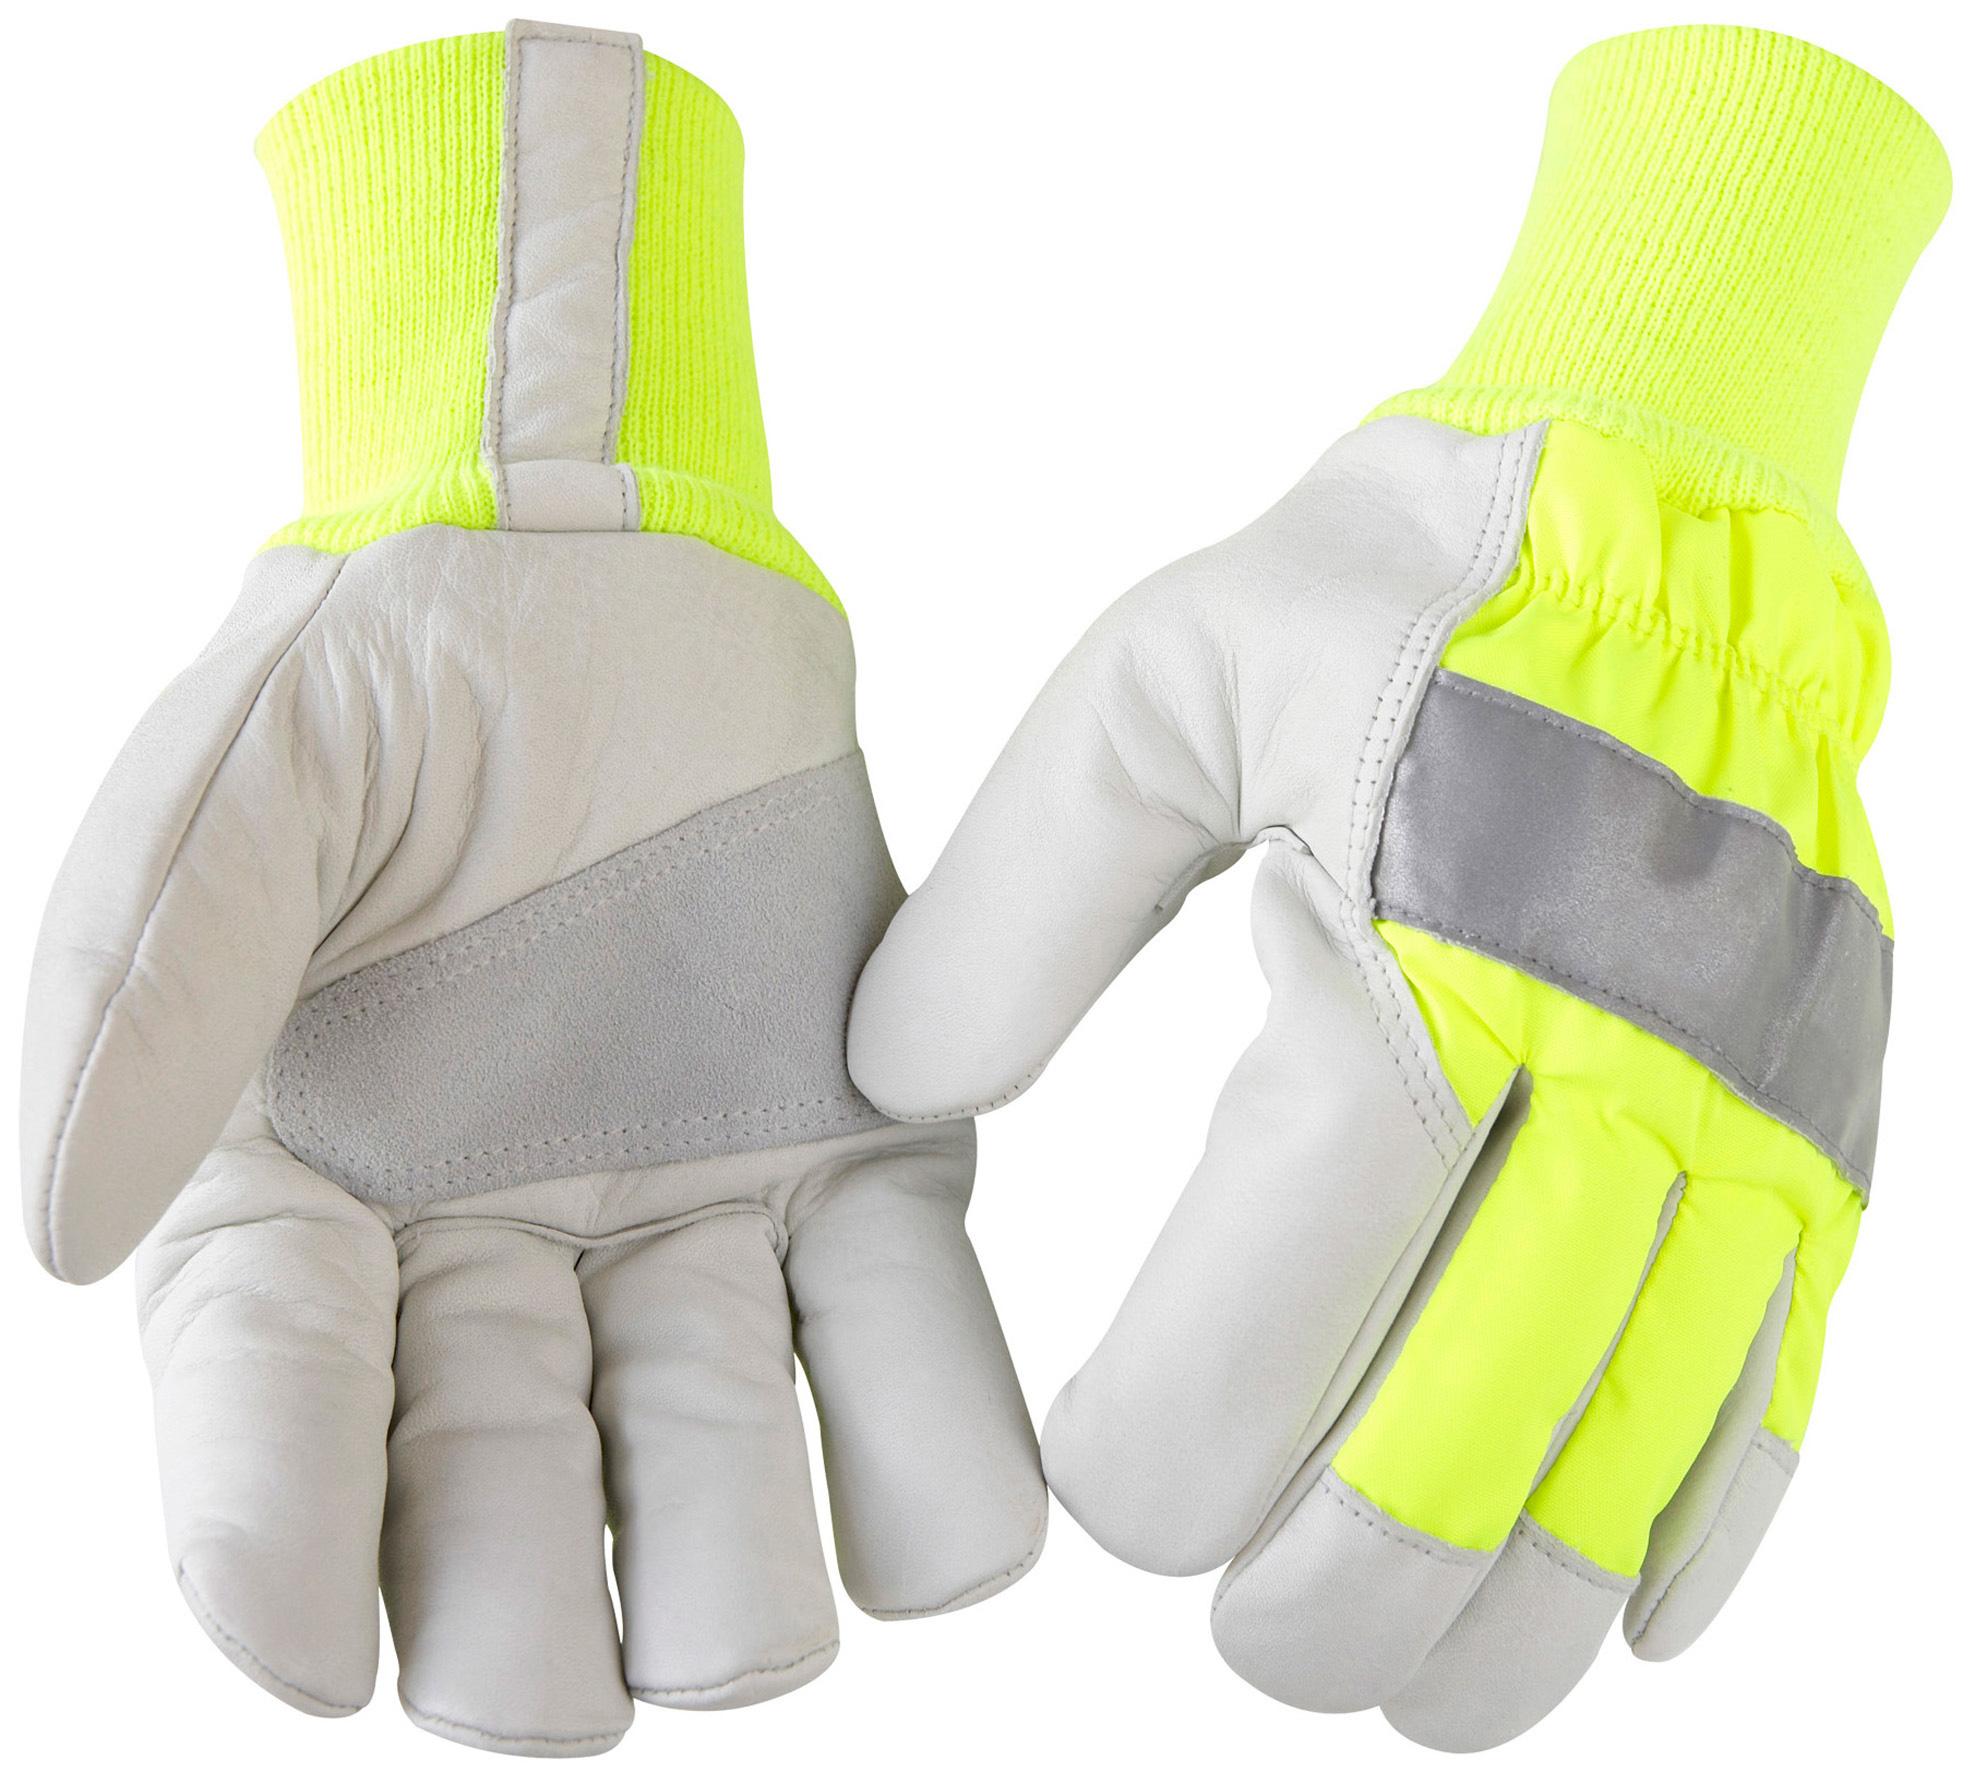 gants haute visibilit hiver jaune gris gants de protection v tements et epi distriartisan. Black Bedroom Furniture Sets. Home Design Ideas